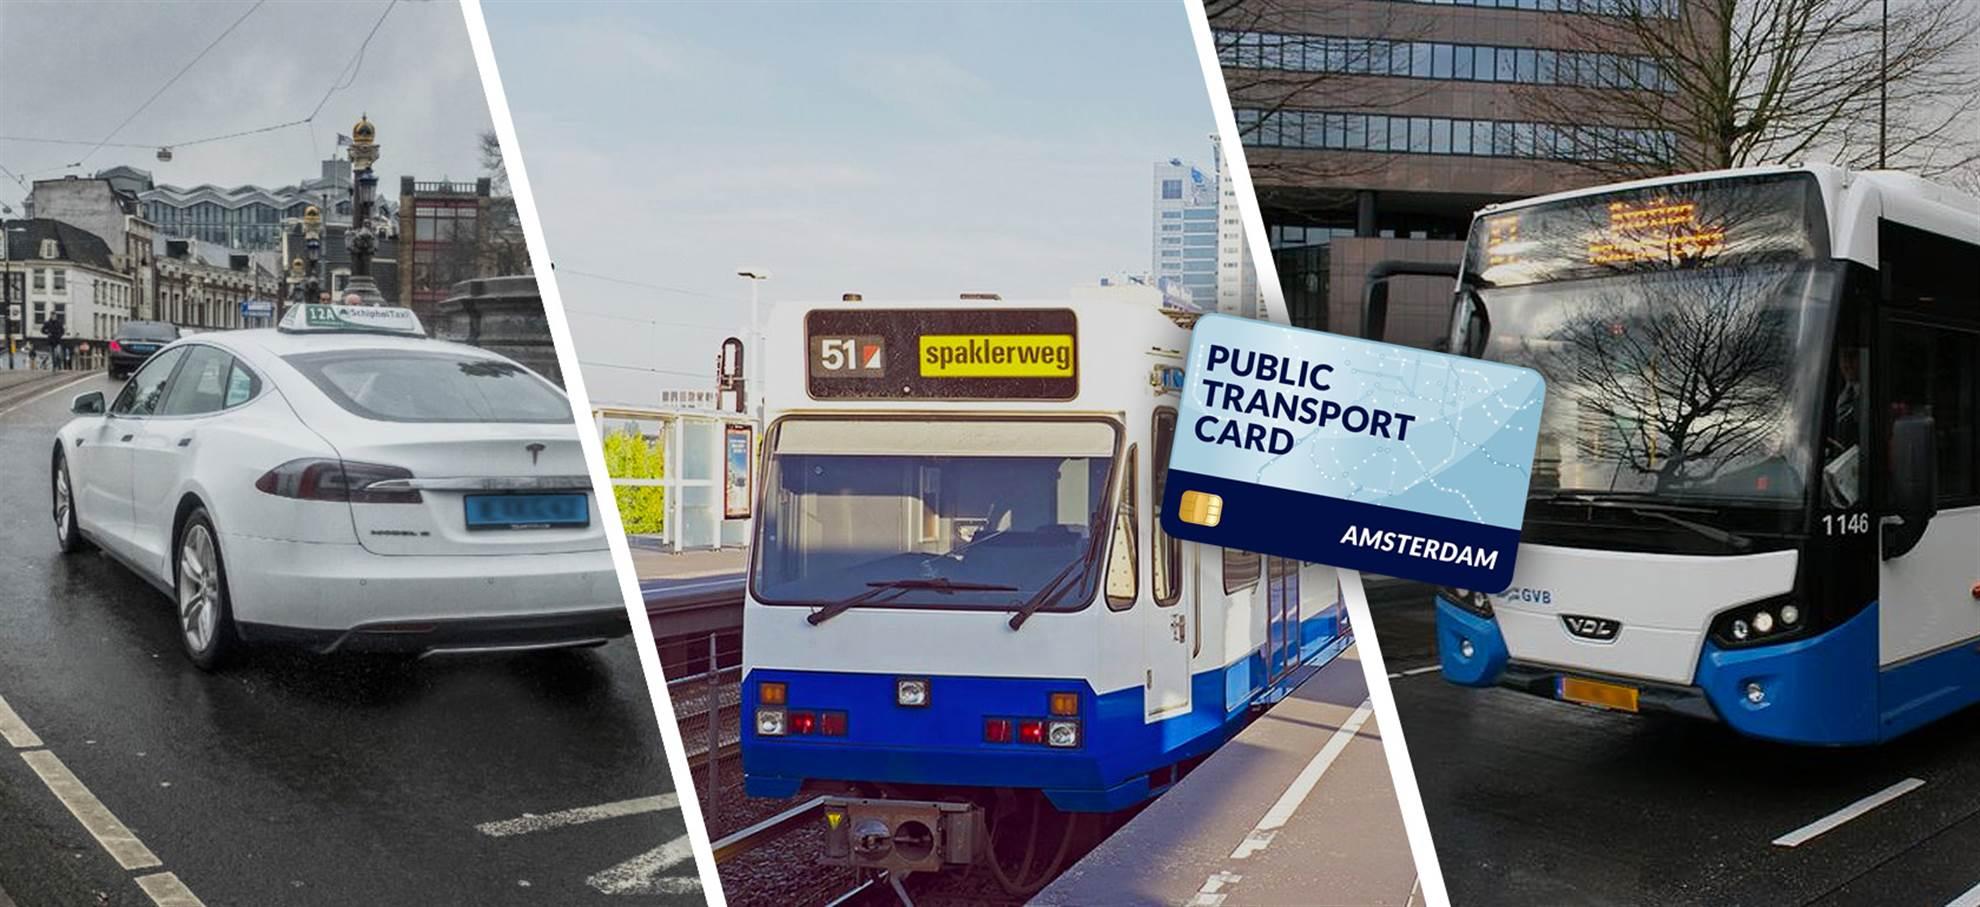 Amsterdam Travel Card